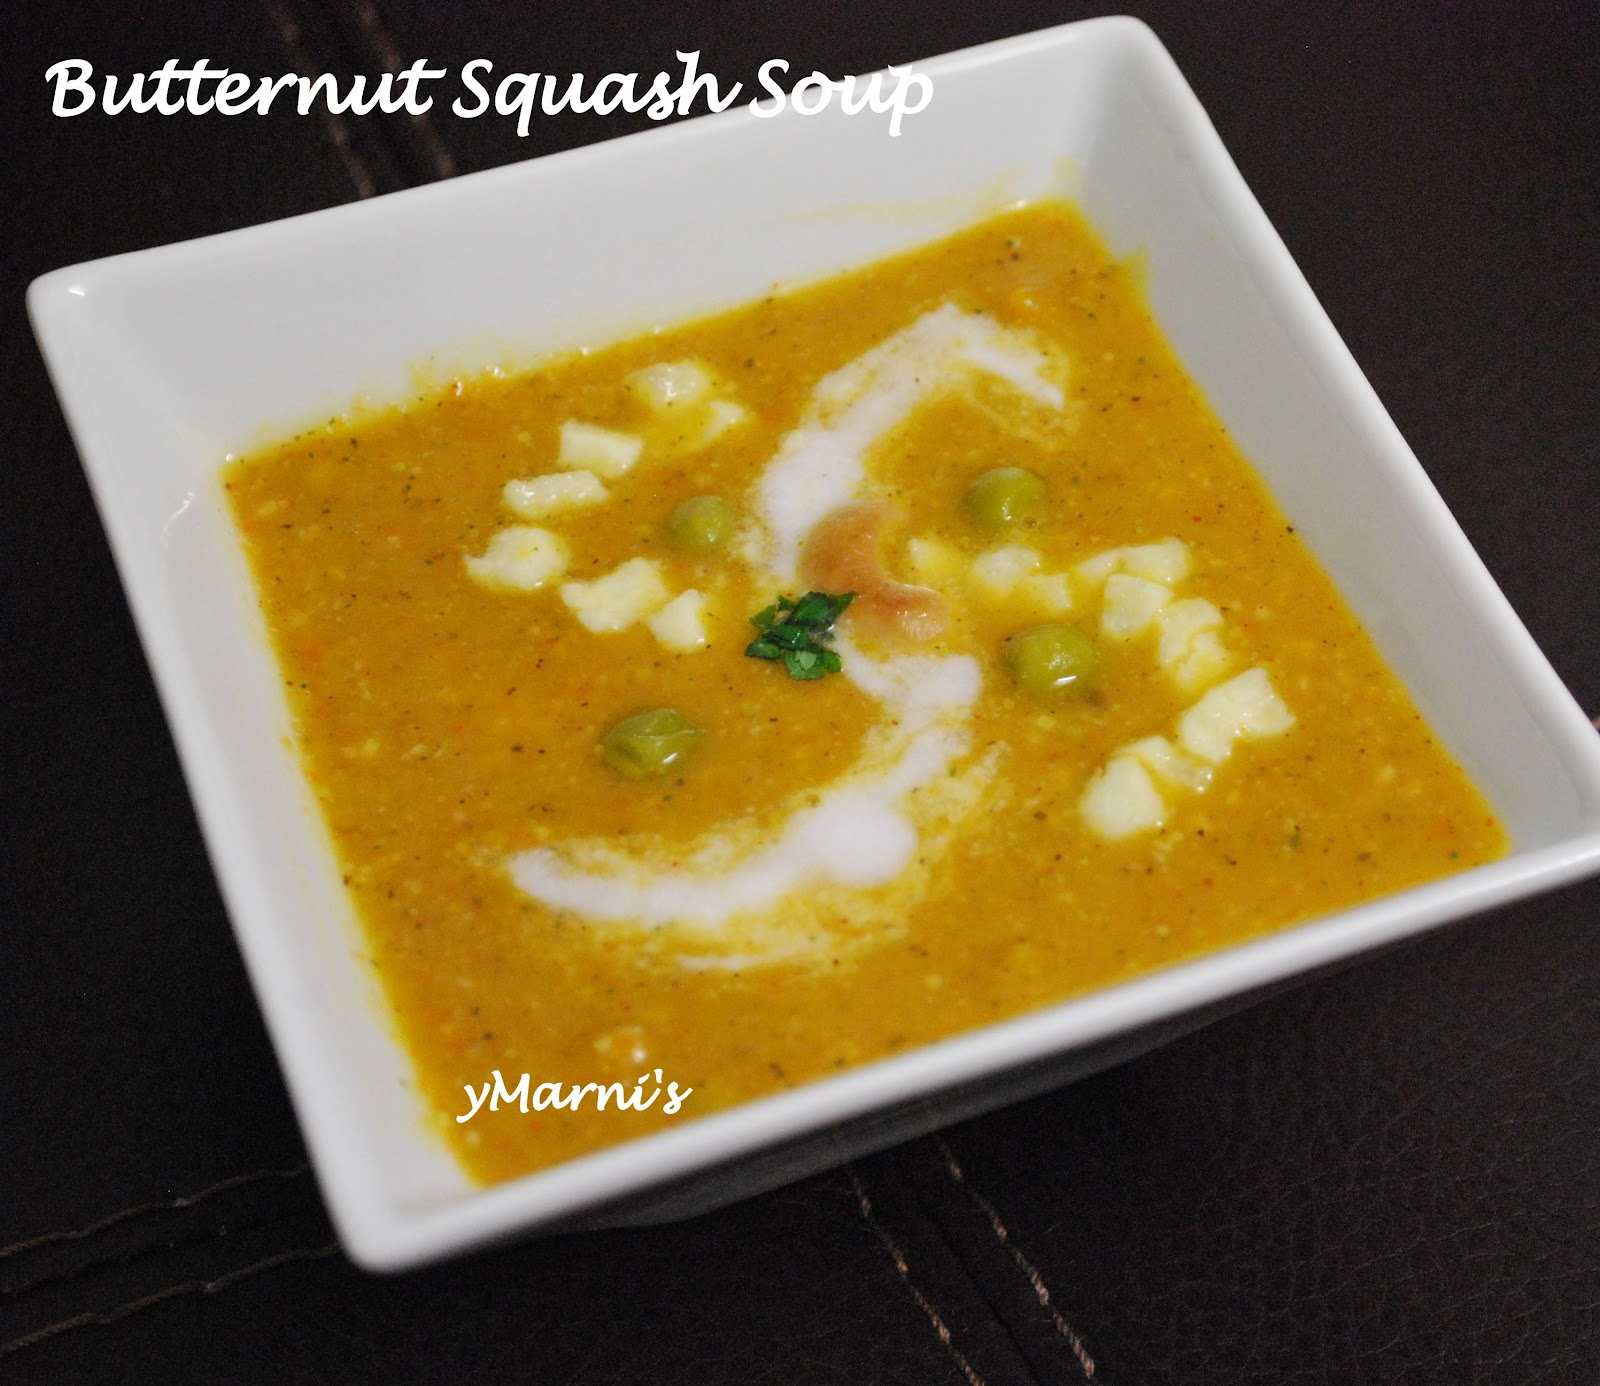 Butternut Squash Soup | yMarni's Vegetarian Compendium